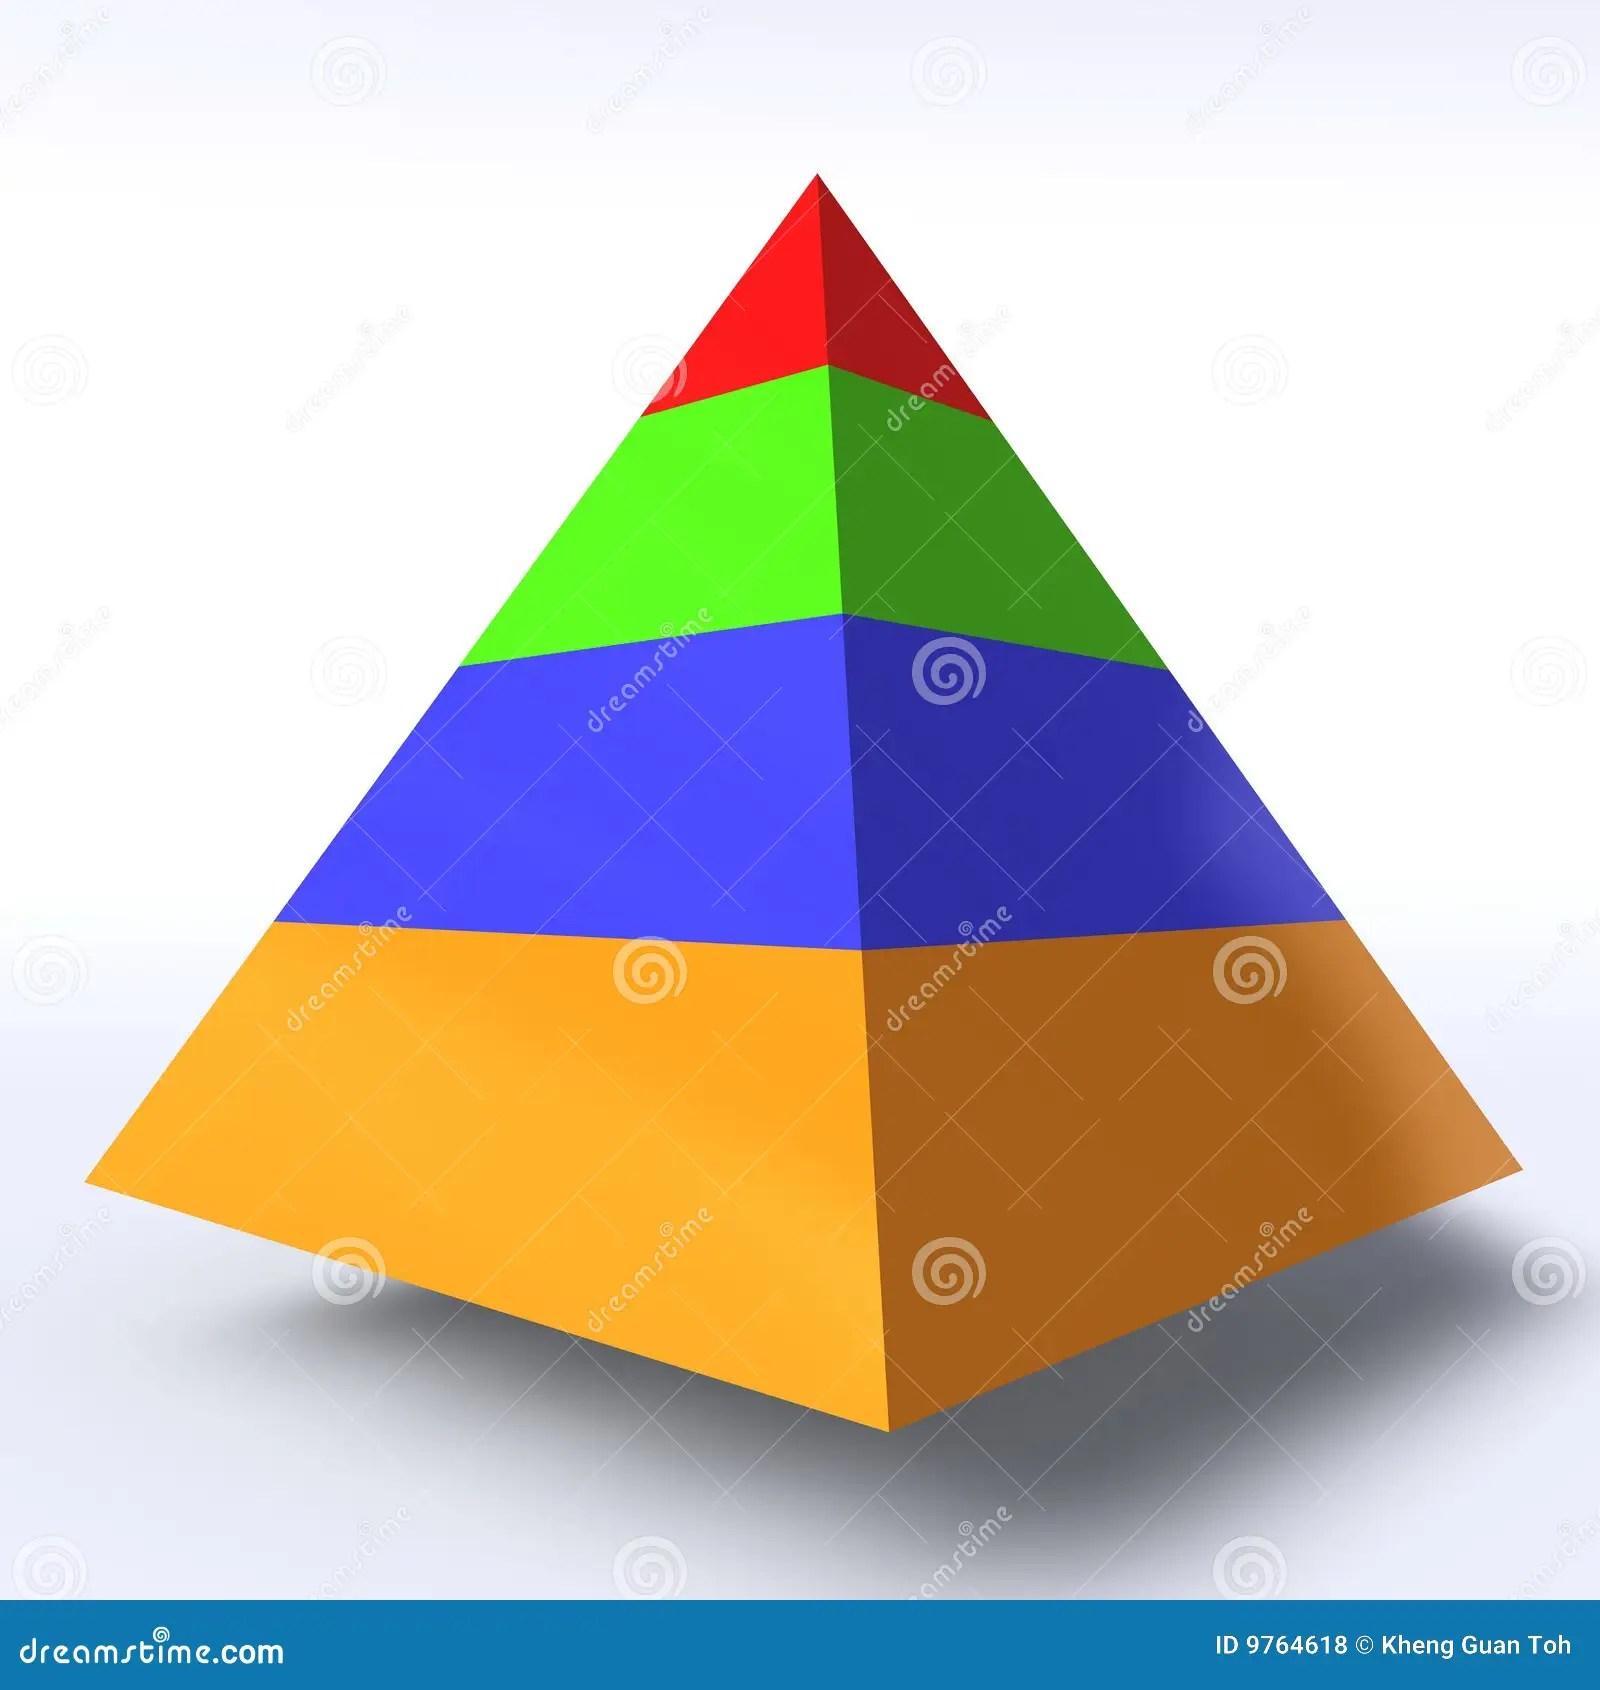 blank pyramid diagram 5 hyundai sonata 2 4 engine hierarchy royalty free stock photos - image: 9764618